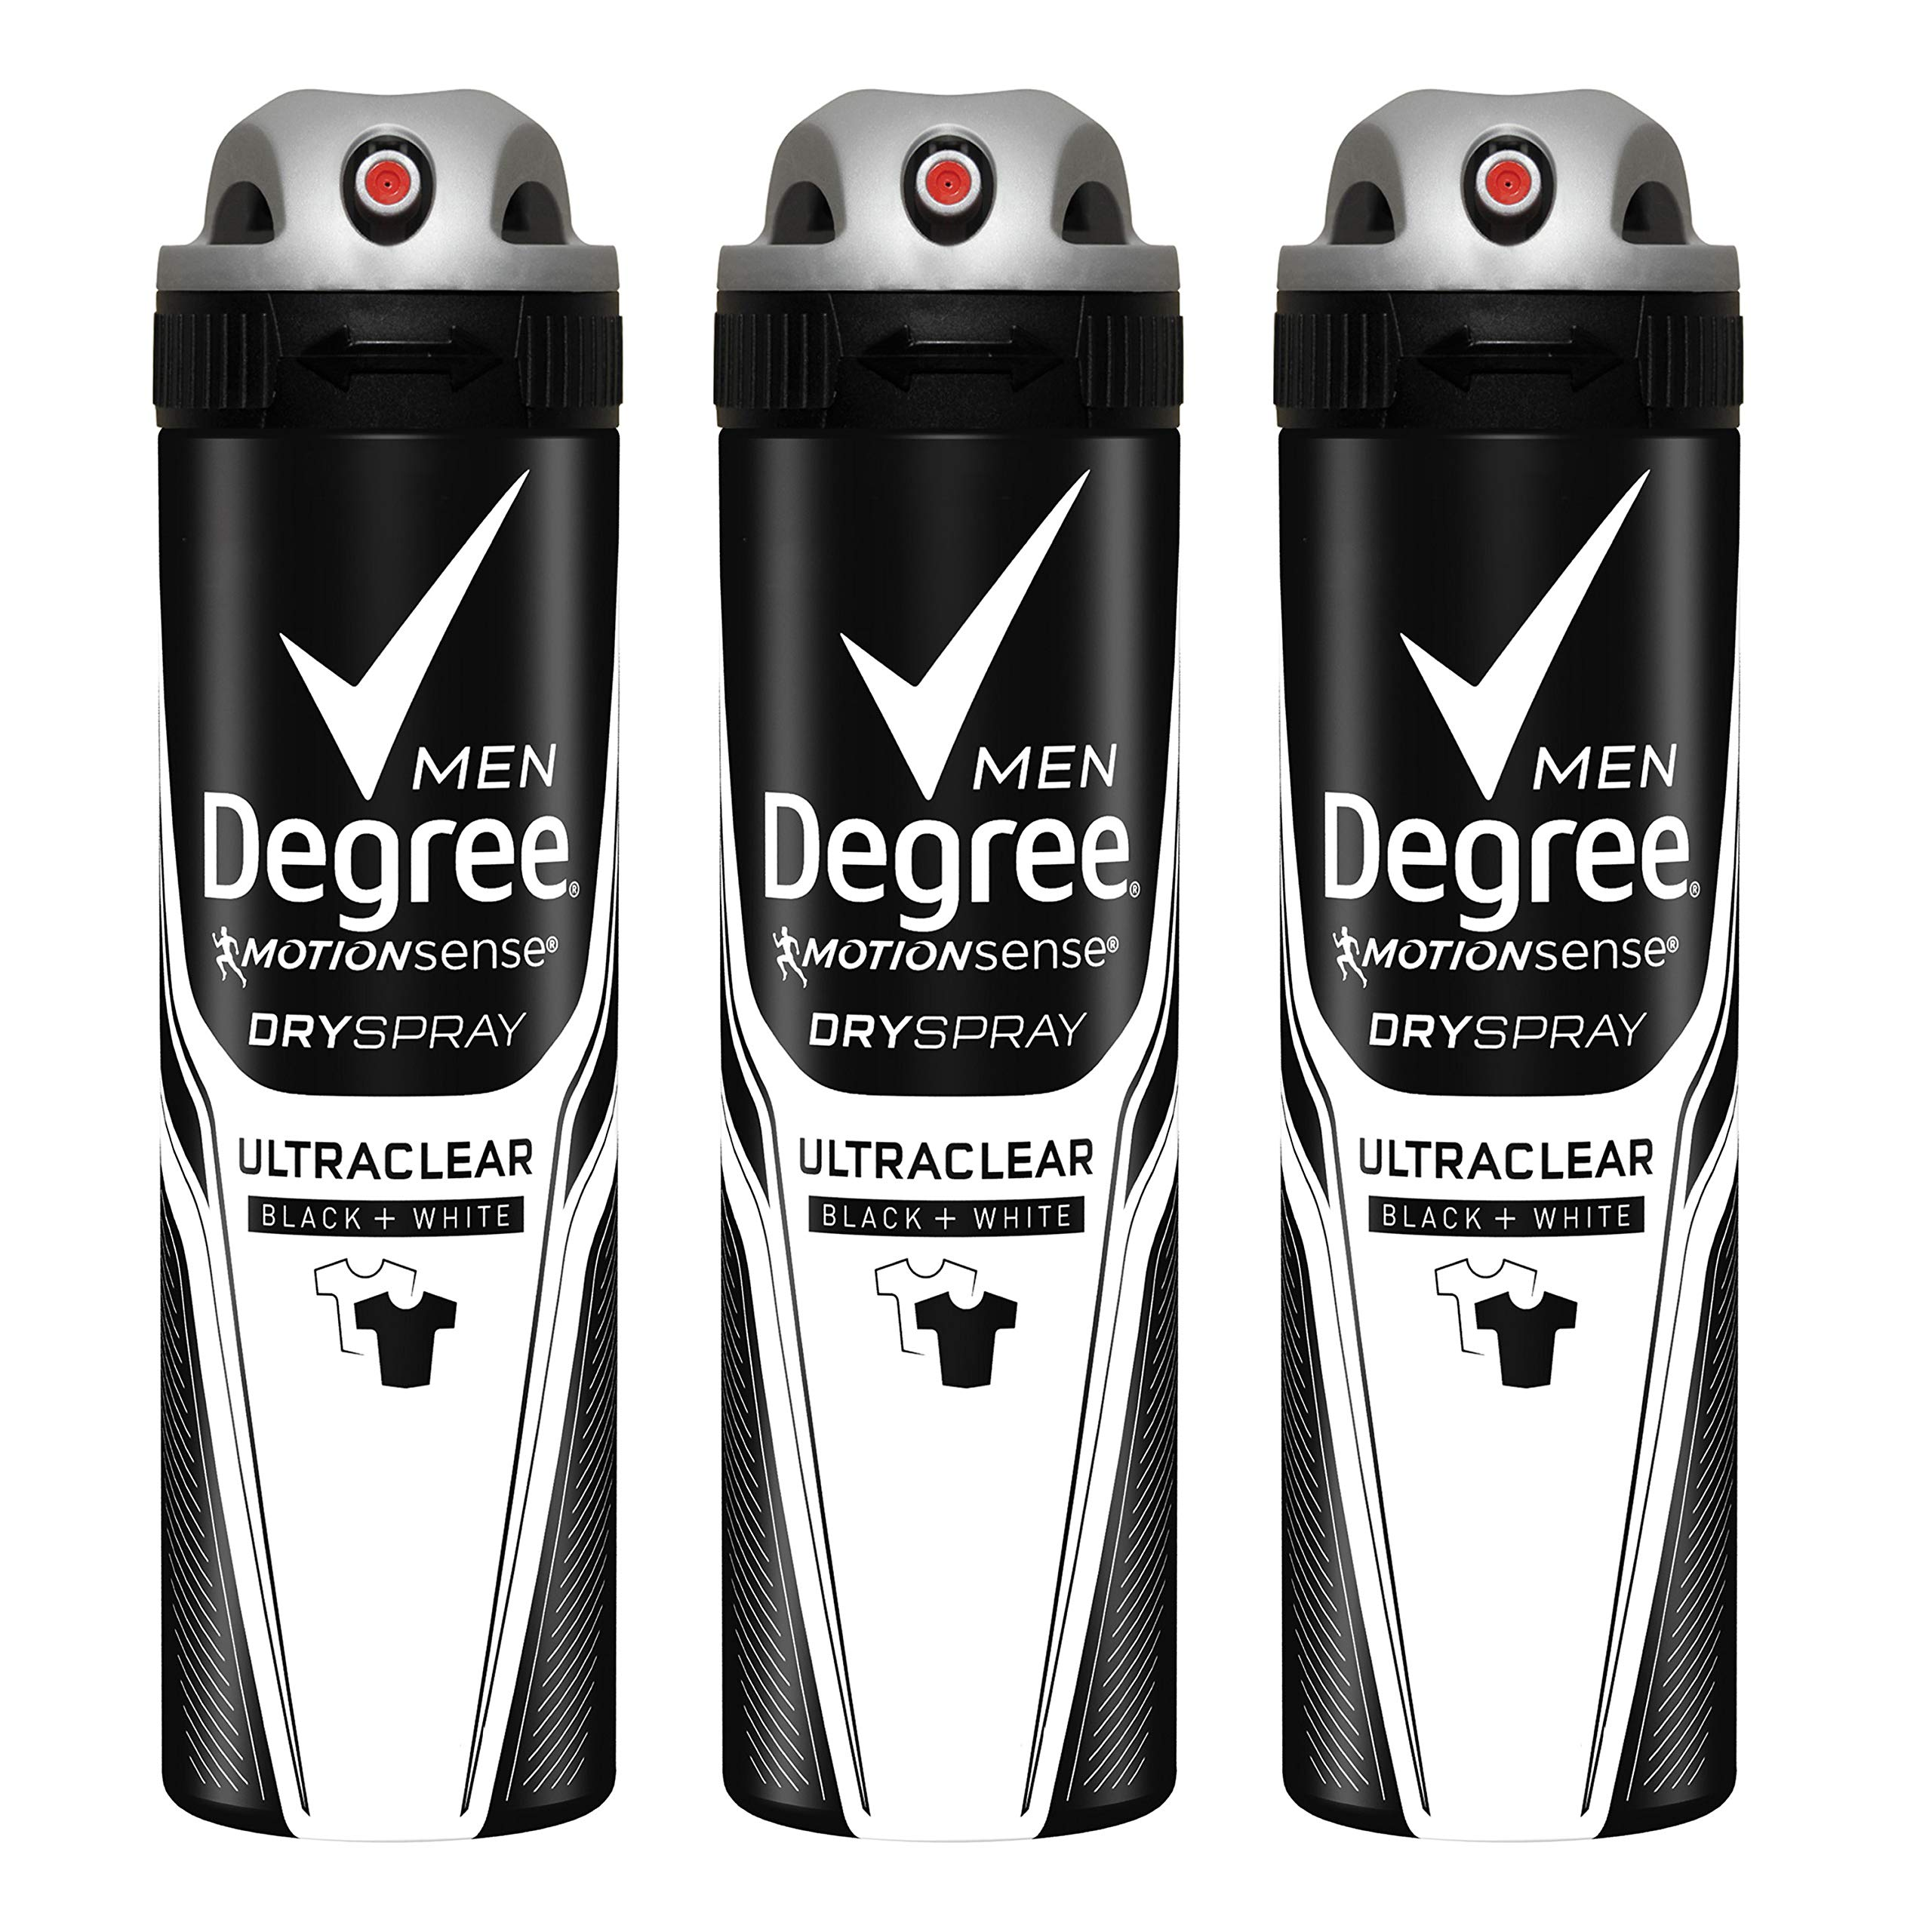 Degree Men MotionSense Antiperspirant Deodorant Dry Spray, UltraClear Black+White, 3.8 oz, 3 count